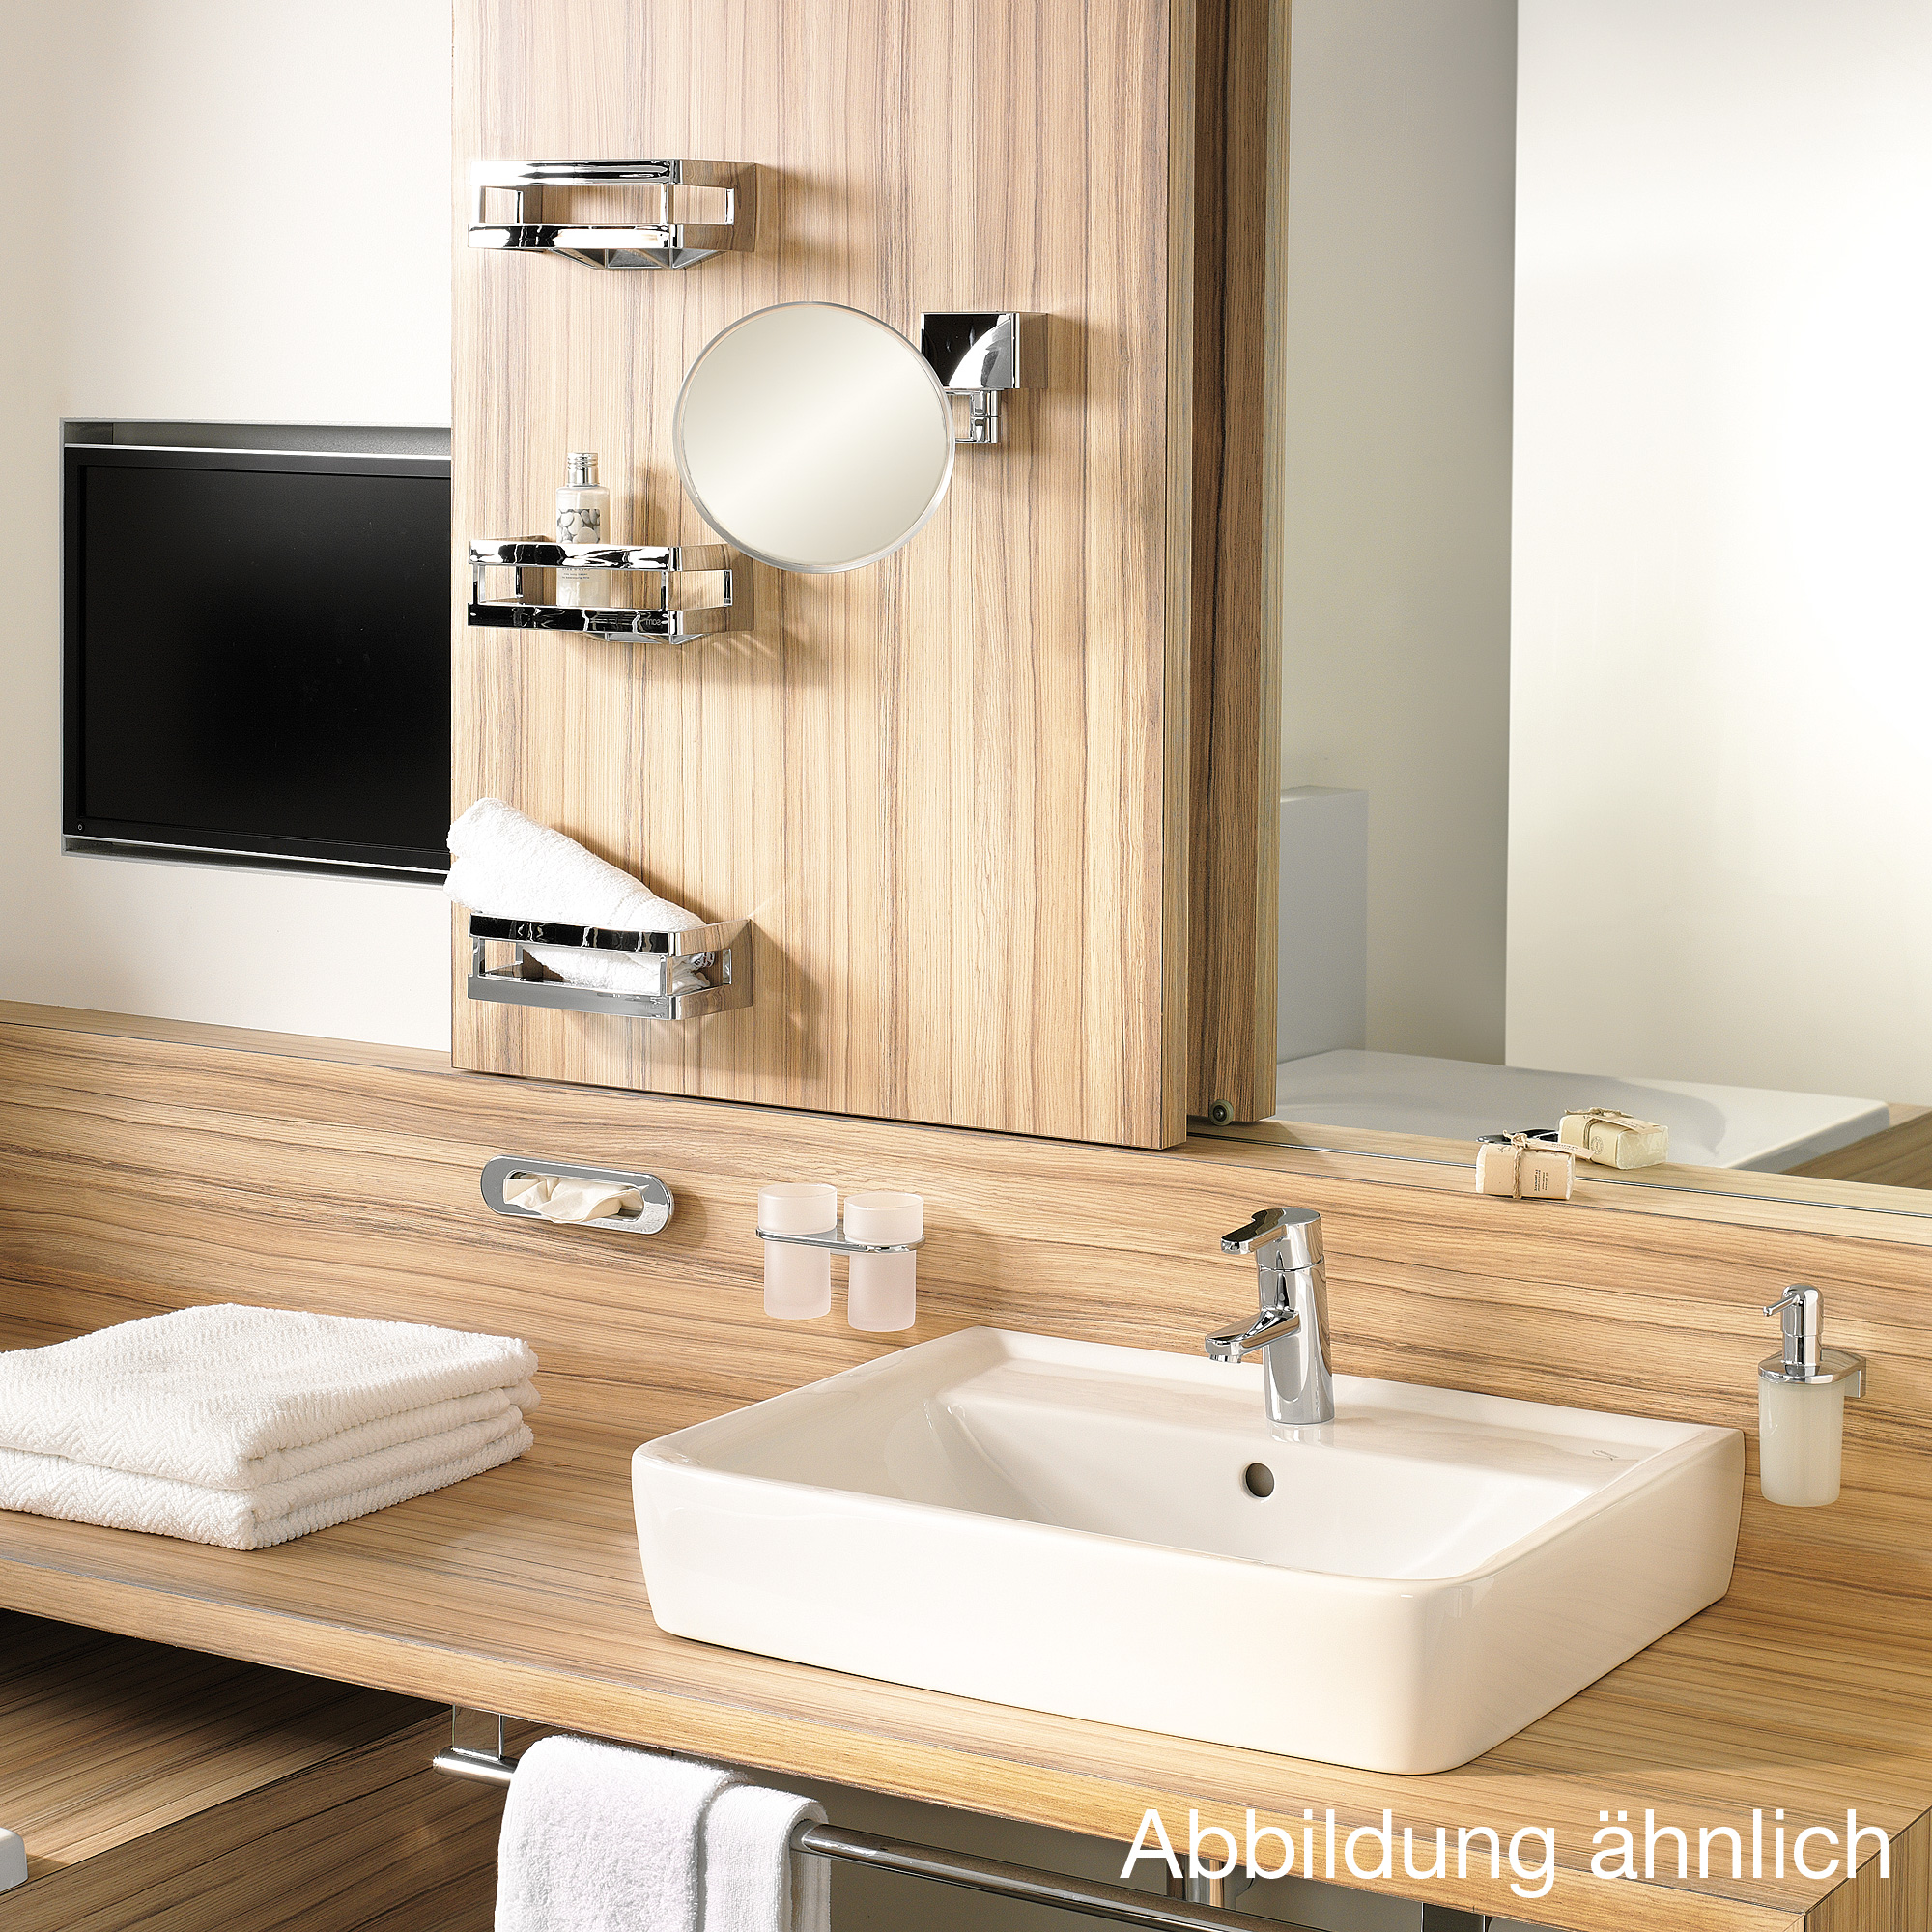 sam miro wand kosmetikspiegel 212 mm ausladung 339 mm 7 fach vergr erung led 5503984010. Black Bedroom Furniture Sets. Home Design Ideas